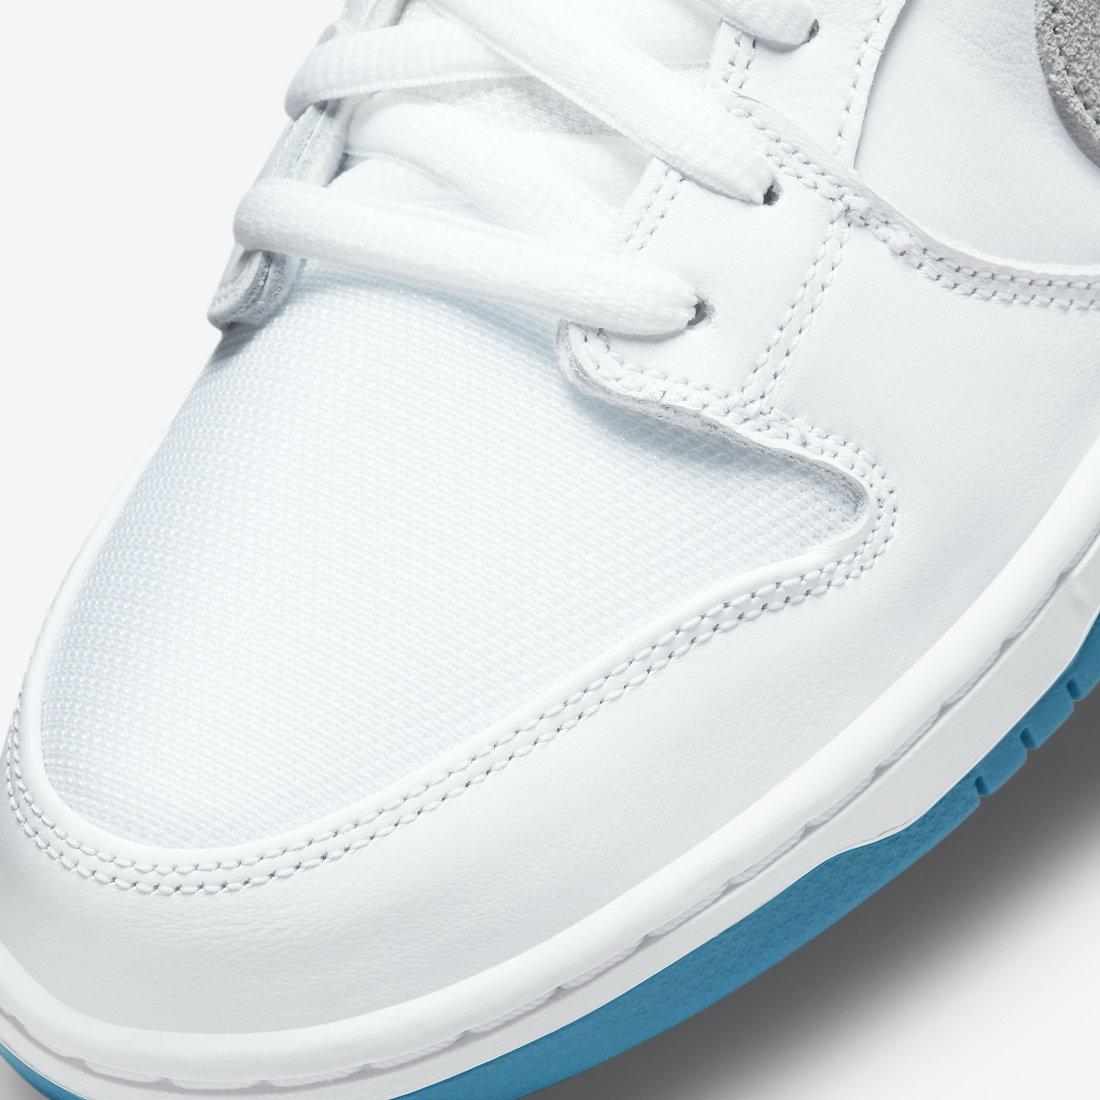 Nike,SB Dunk Low,BQ6817-101,La  OG 配色回归!全新 SB Dunk Low 官图曝光!